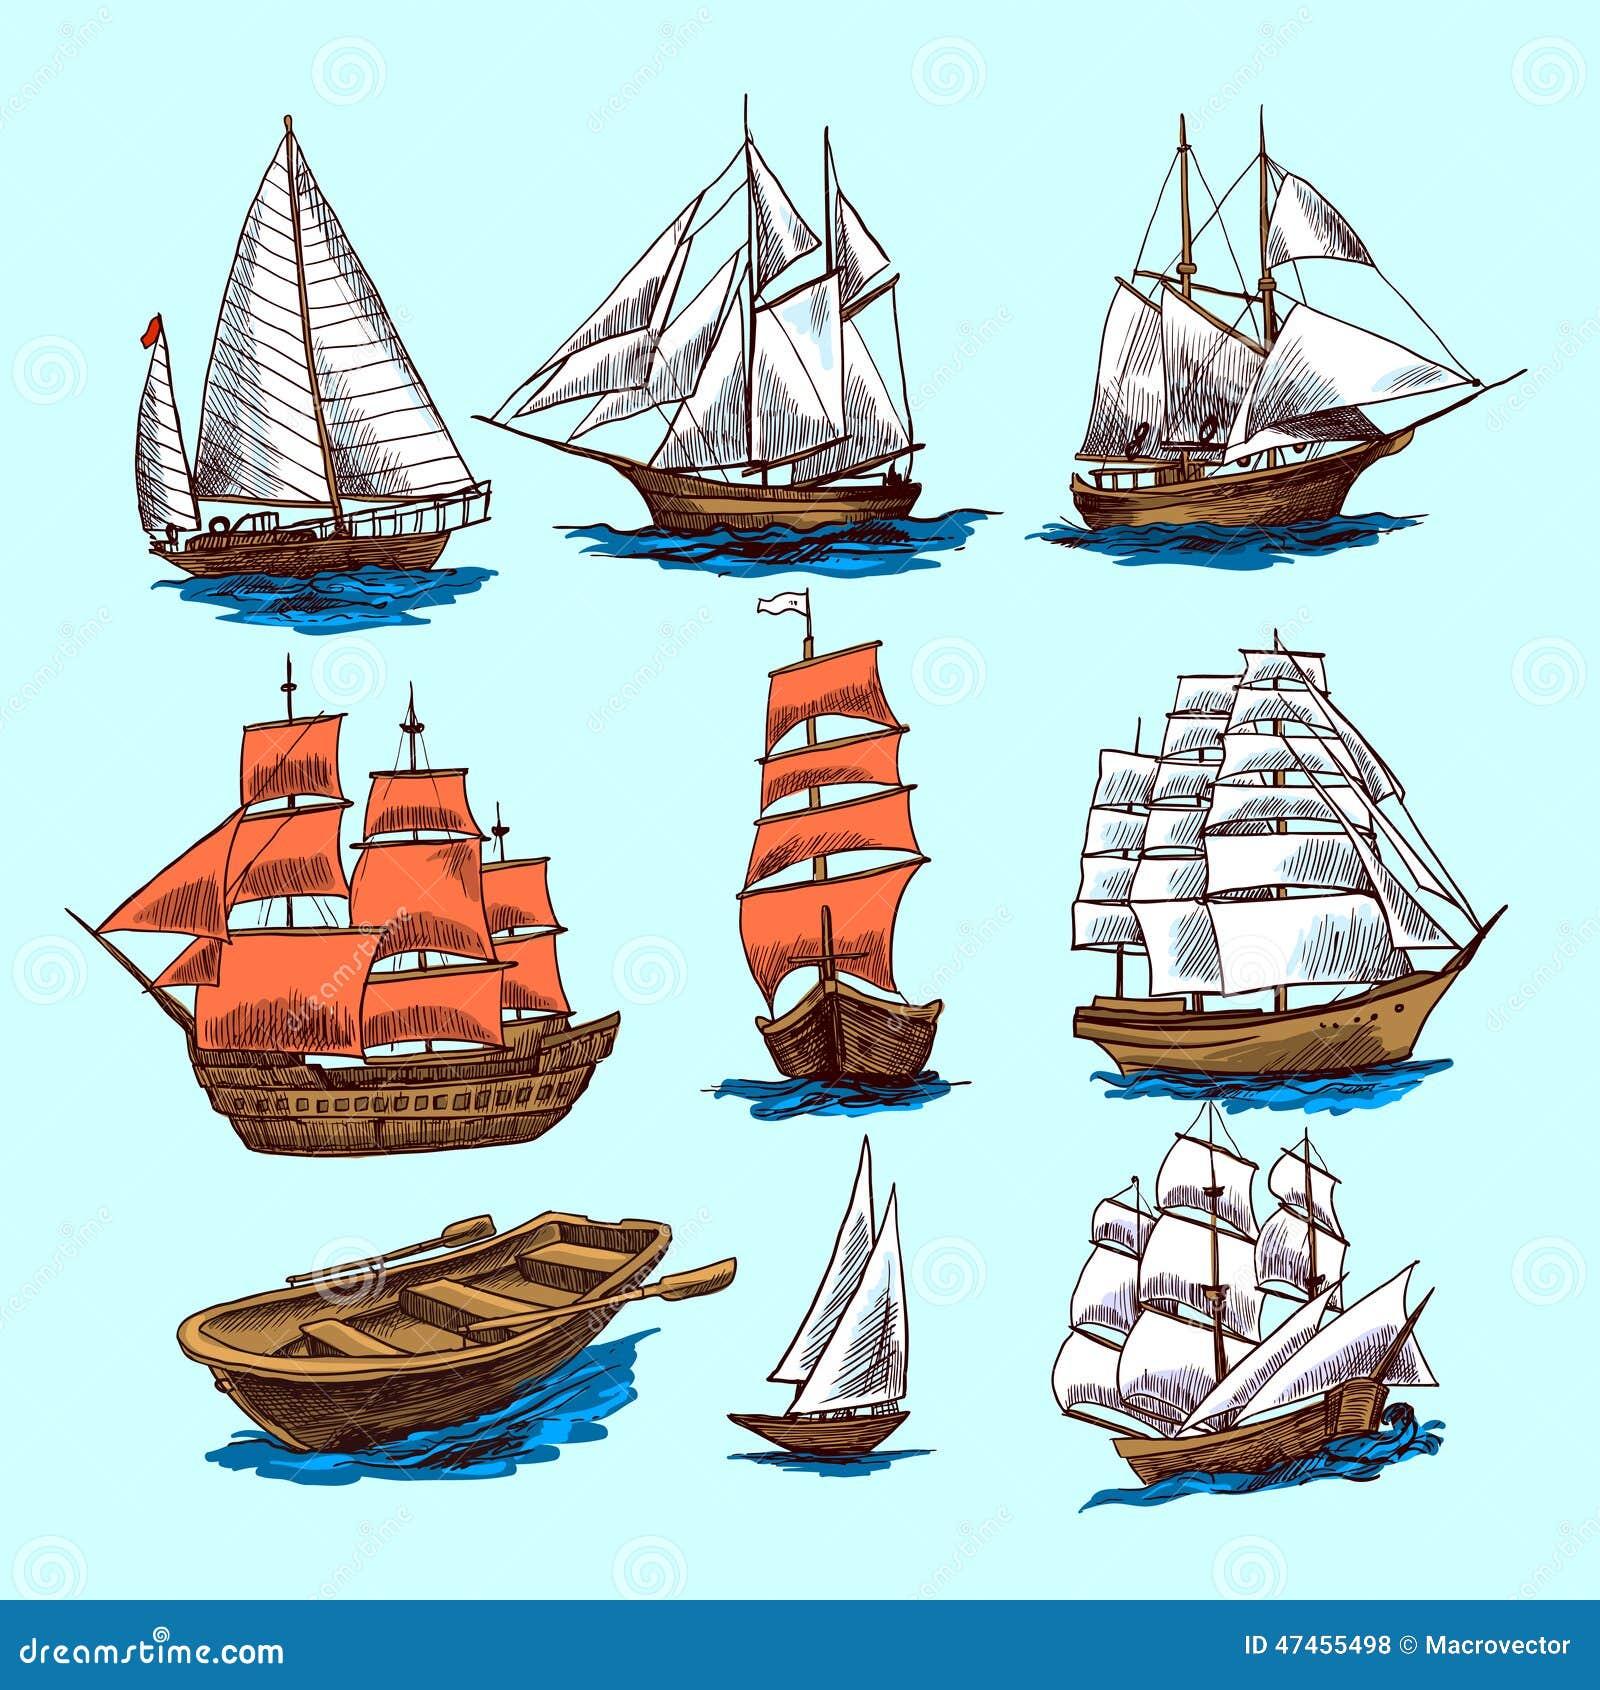 Vintage Sailboat Sketch Ships And Boats Sketch...